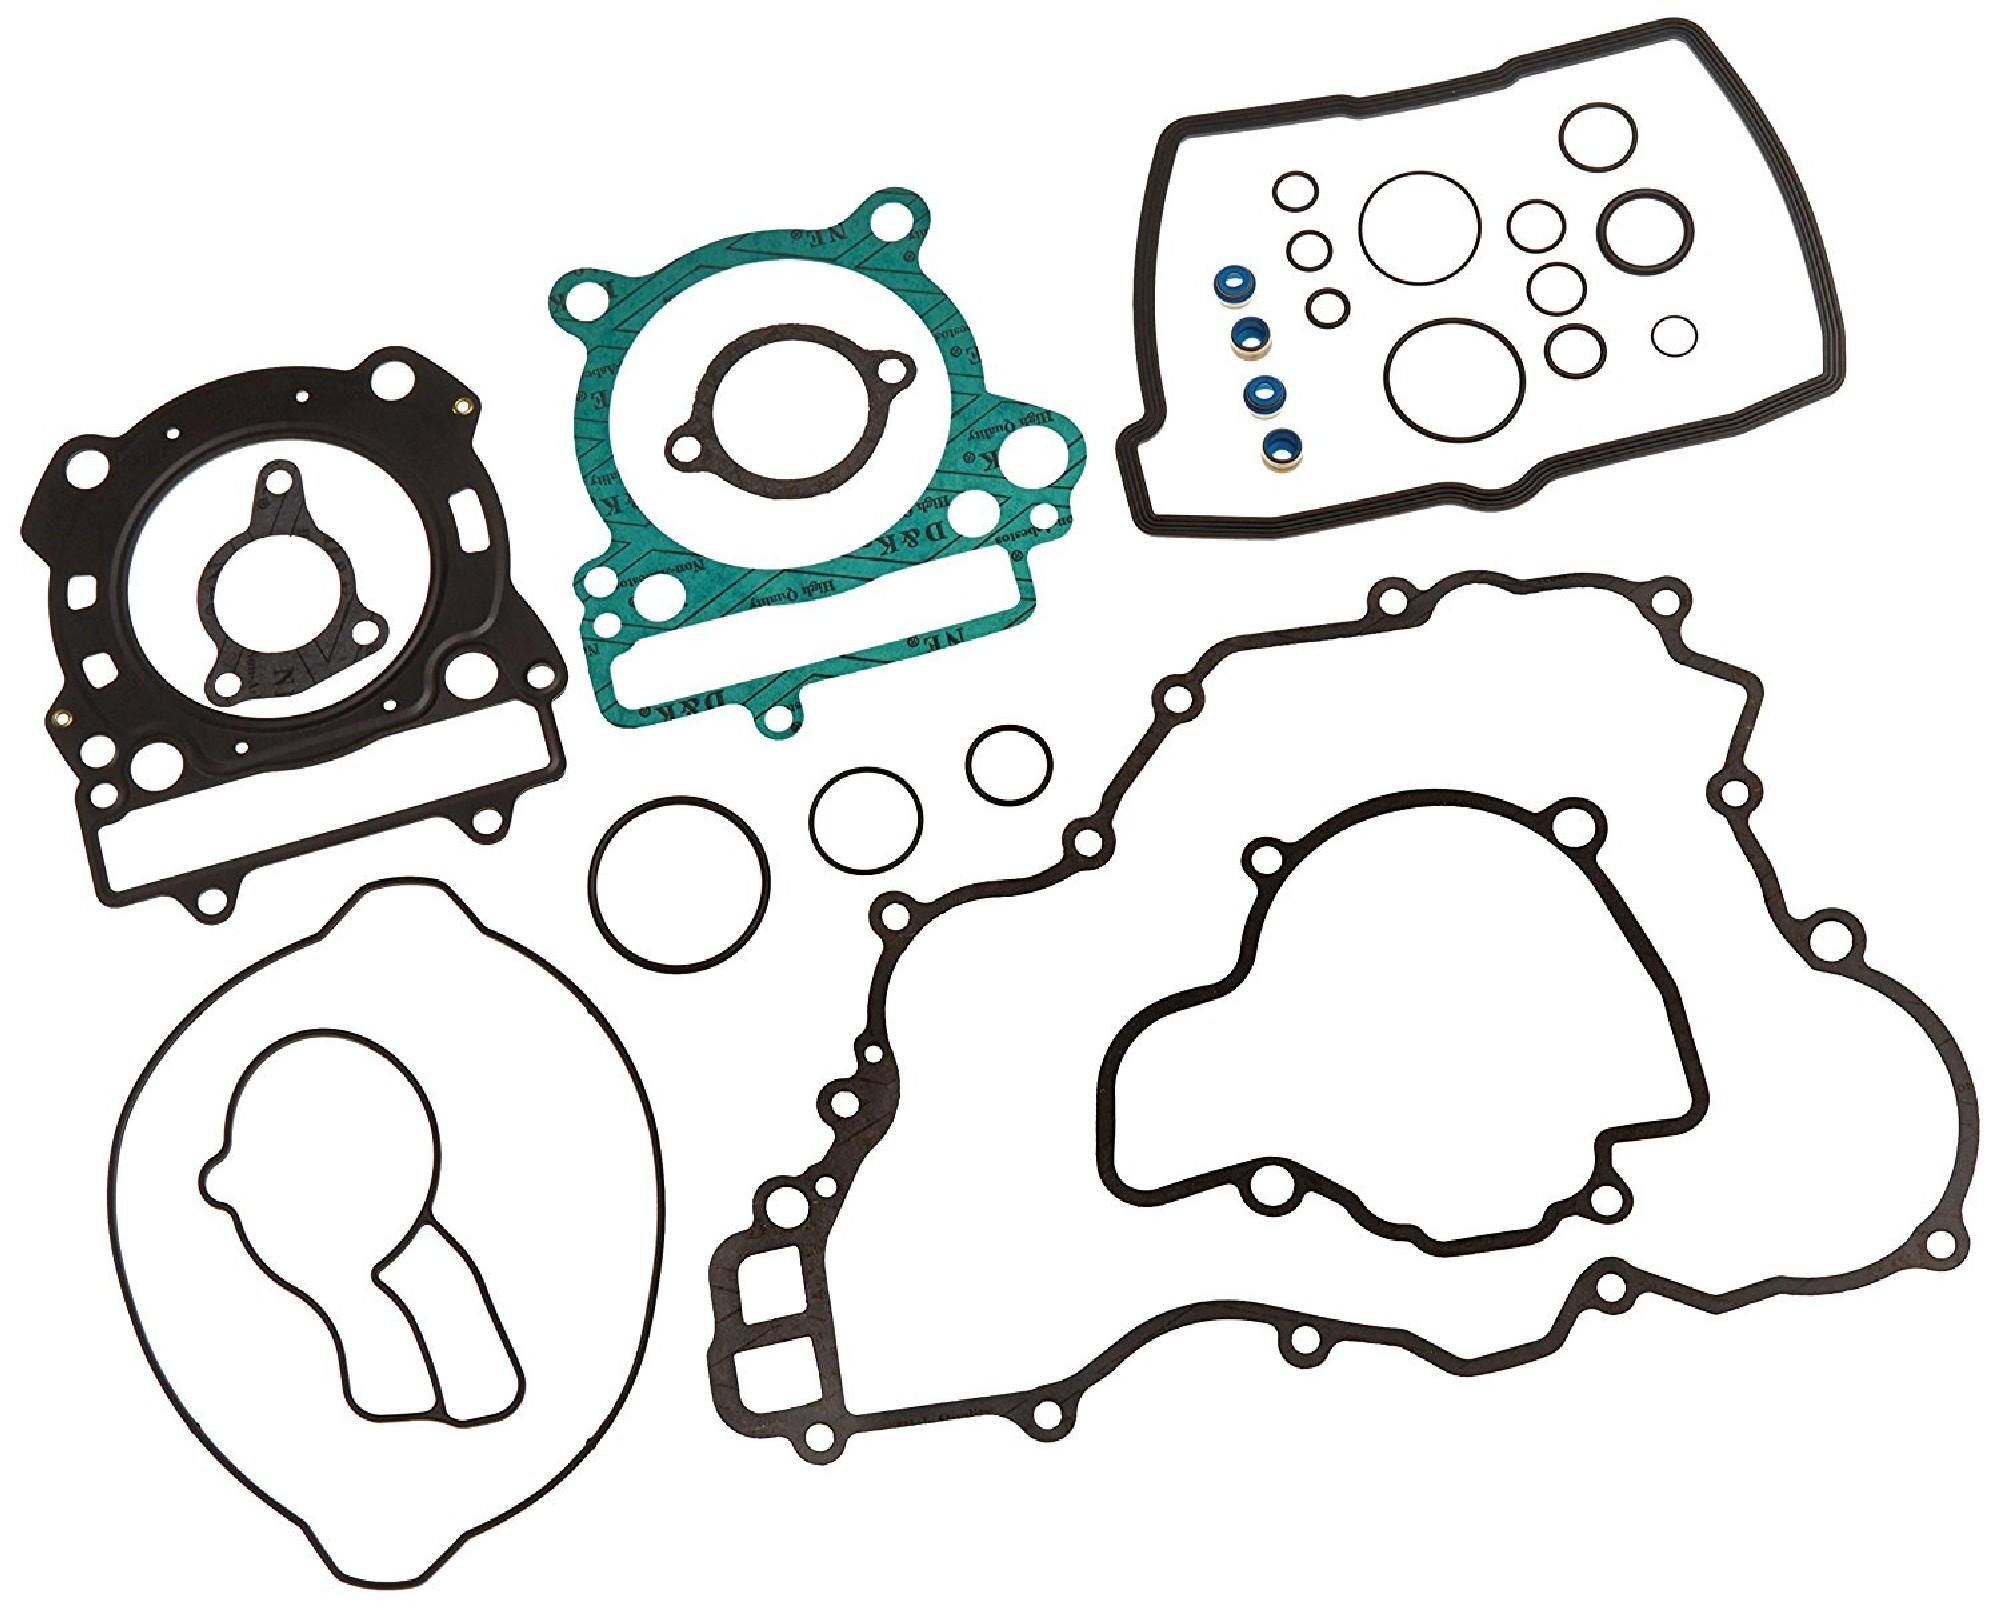 New Vertex Complete Gasket Set W/O Seals for KTM 250 XCF-W